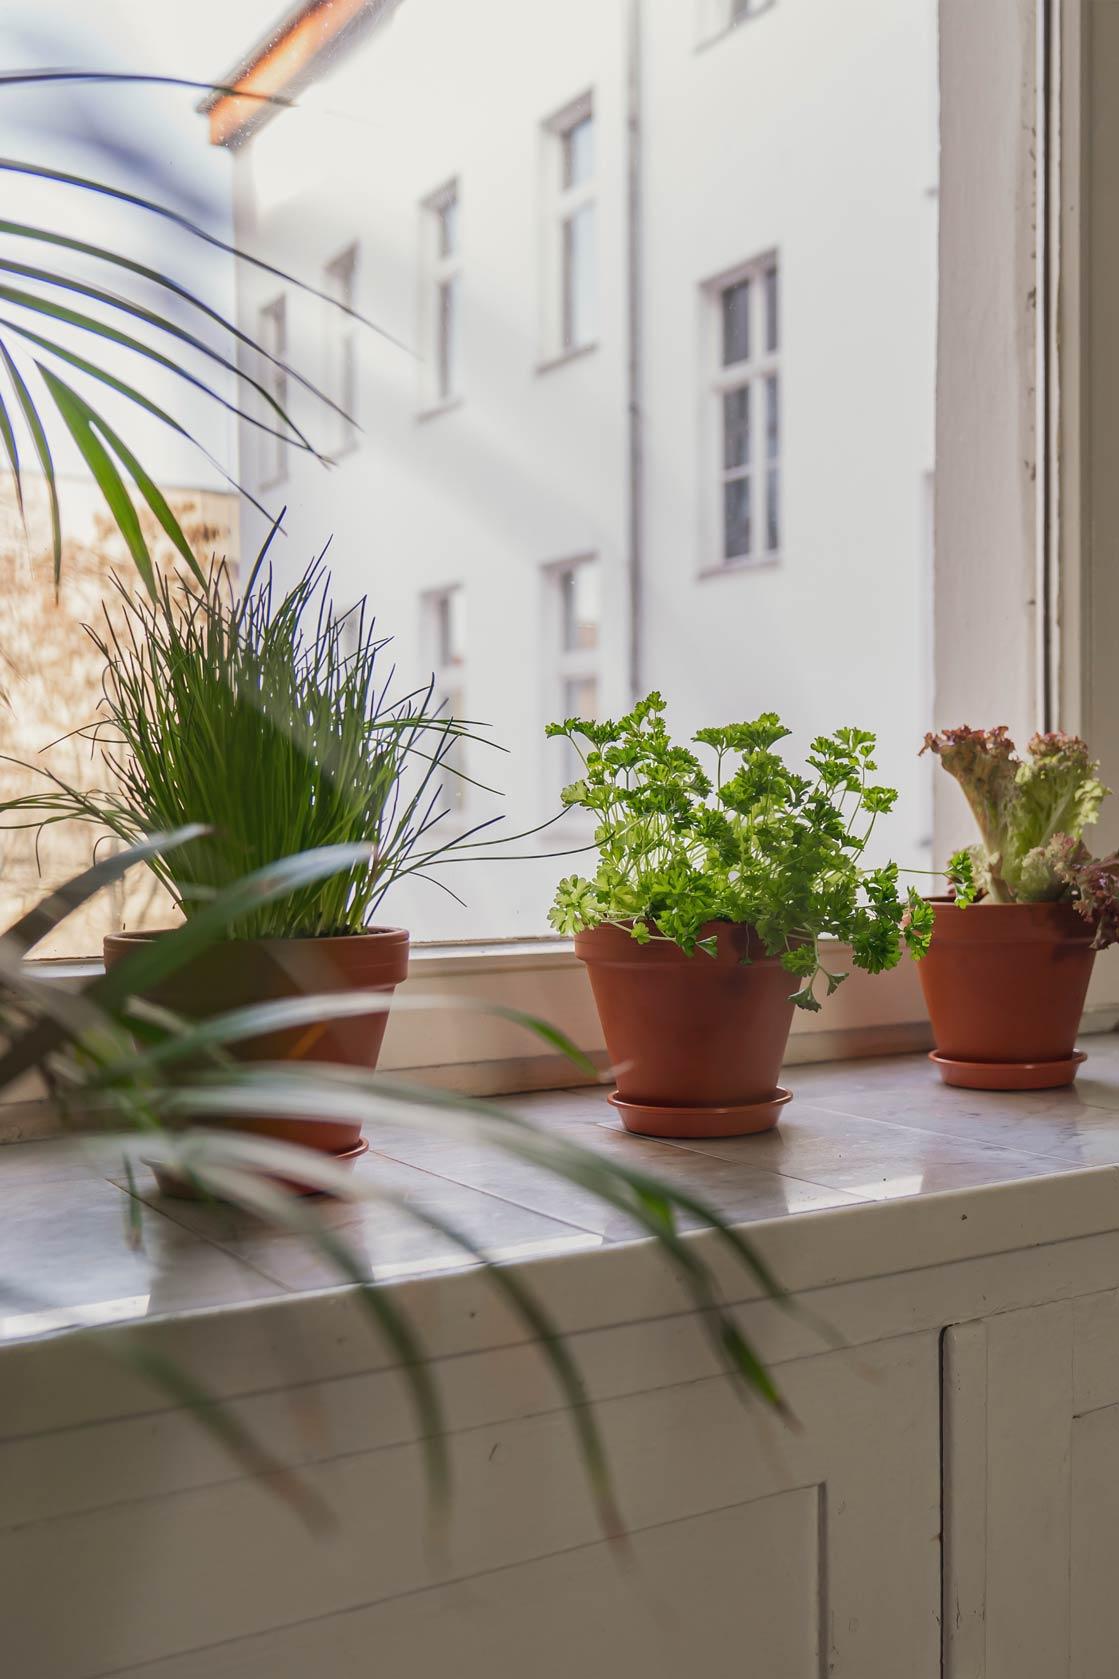 Herbs in the window sill